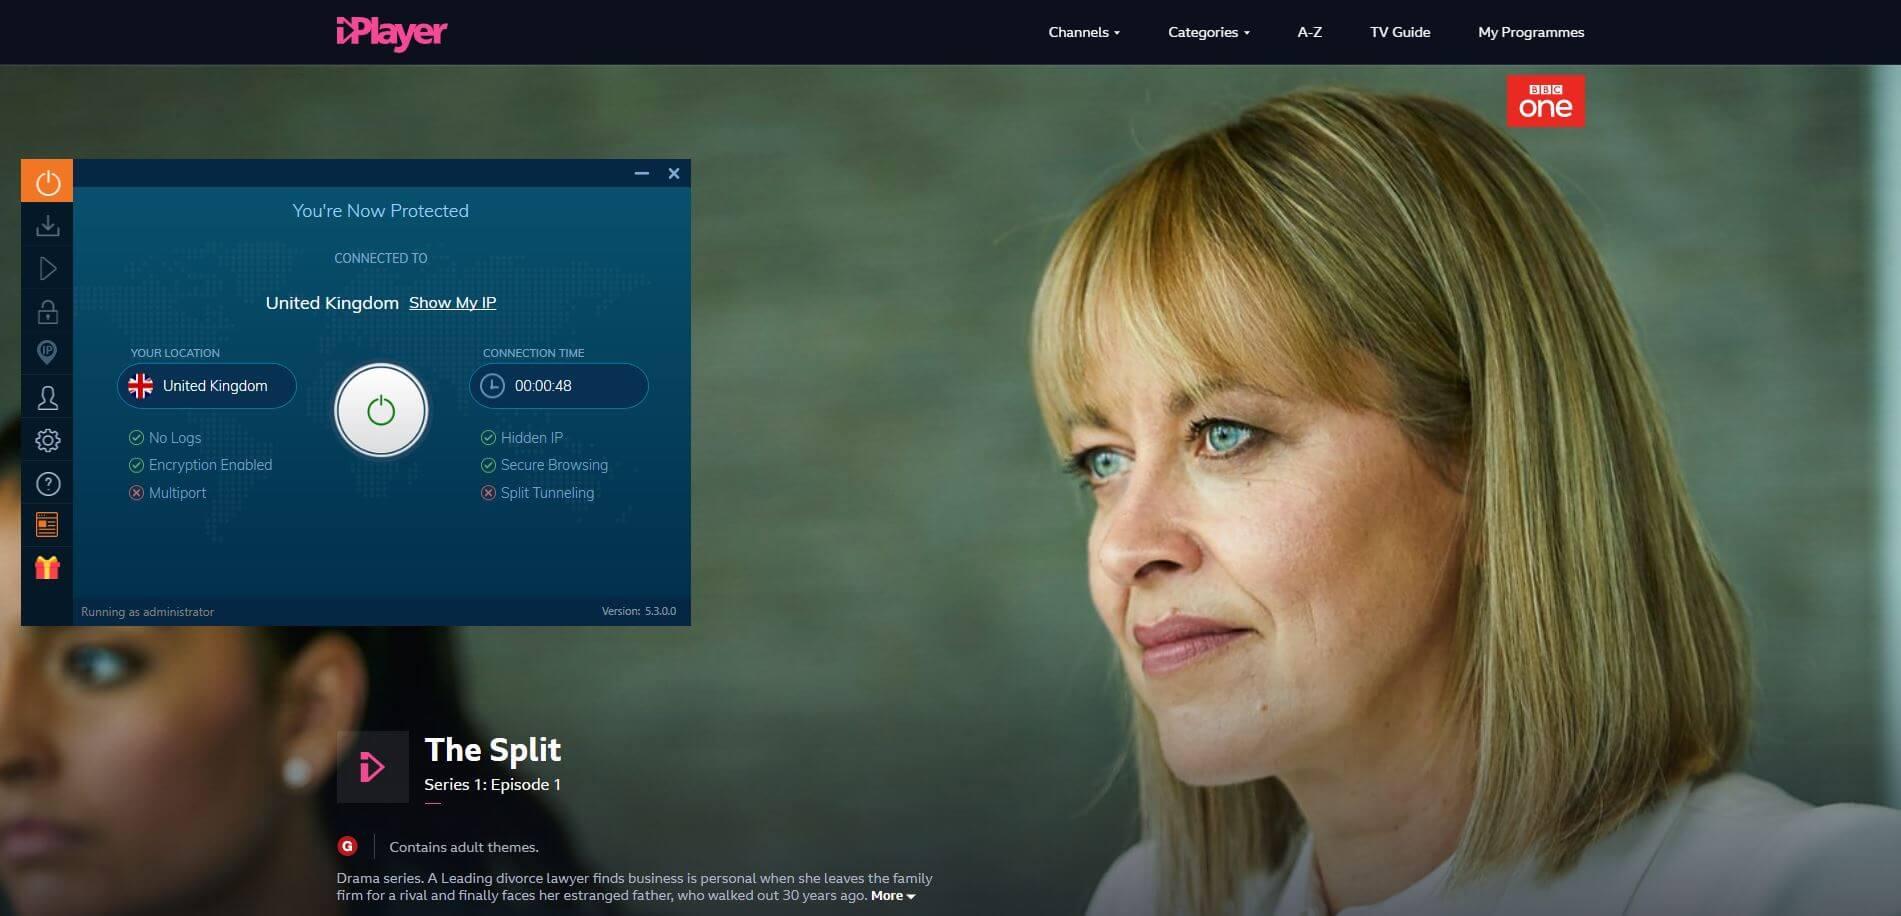 Ivacy BBC iPlayer